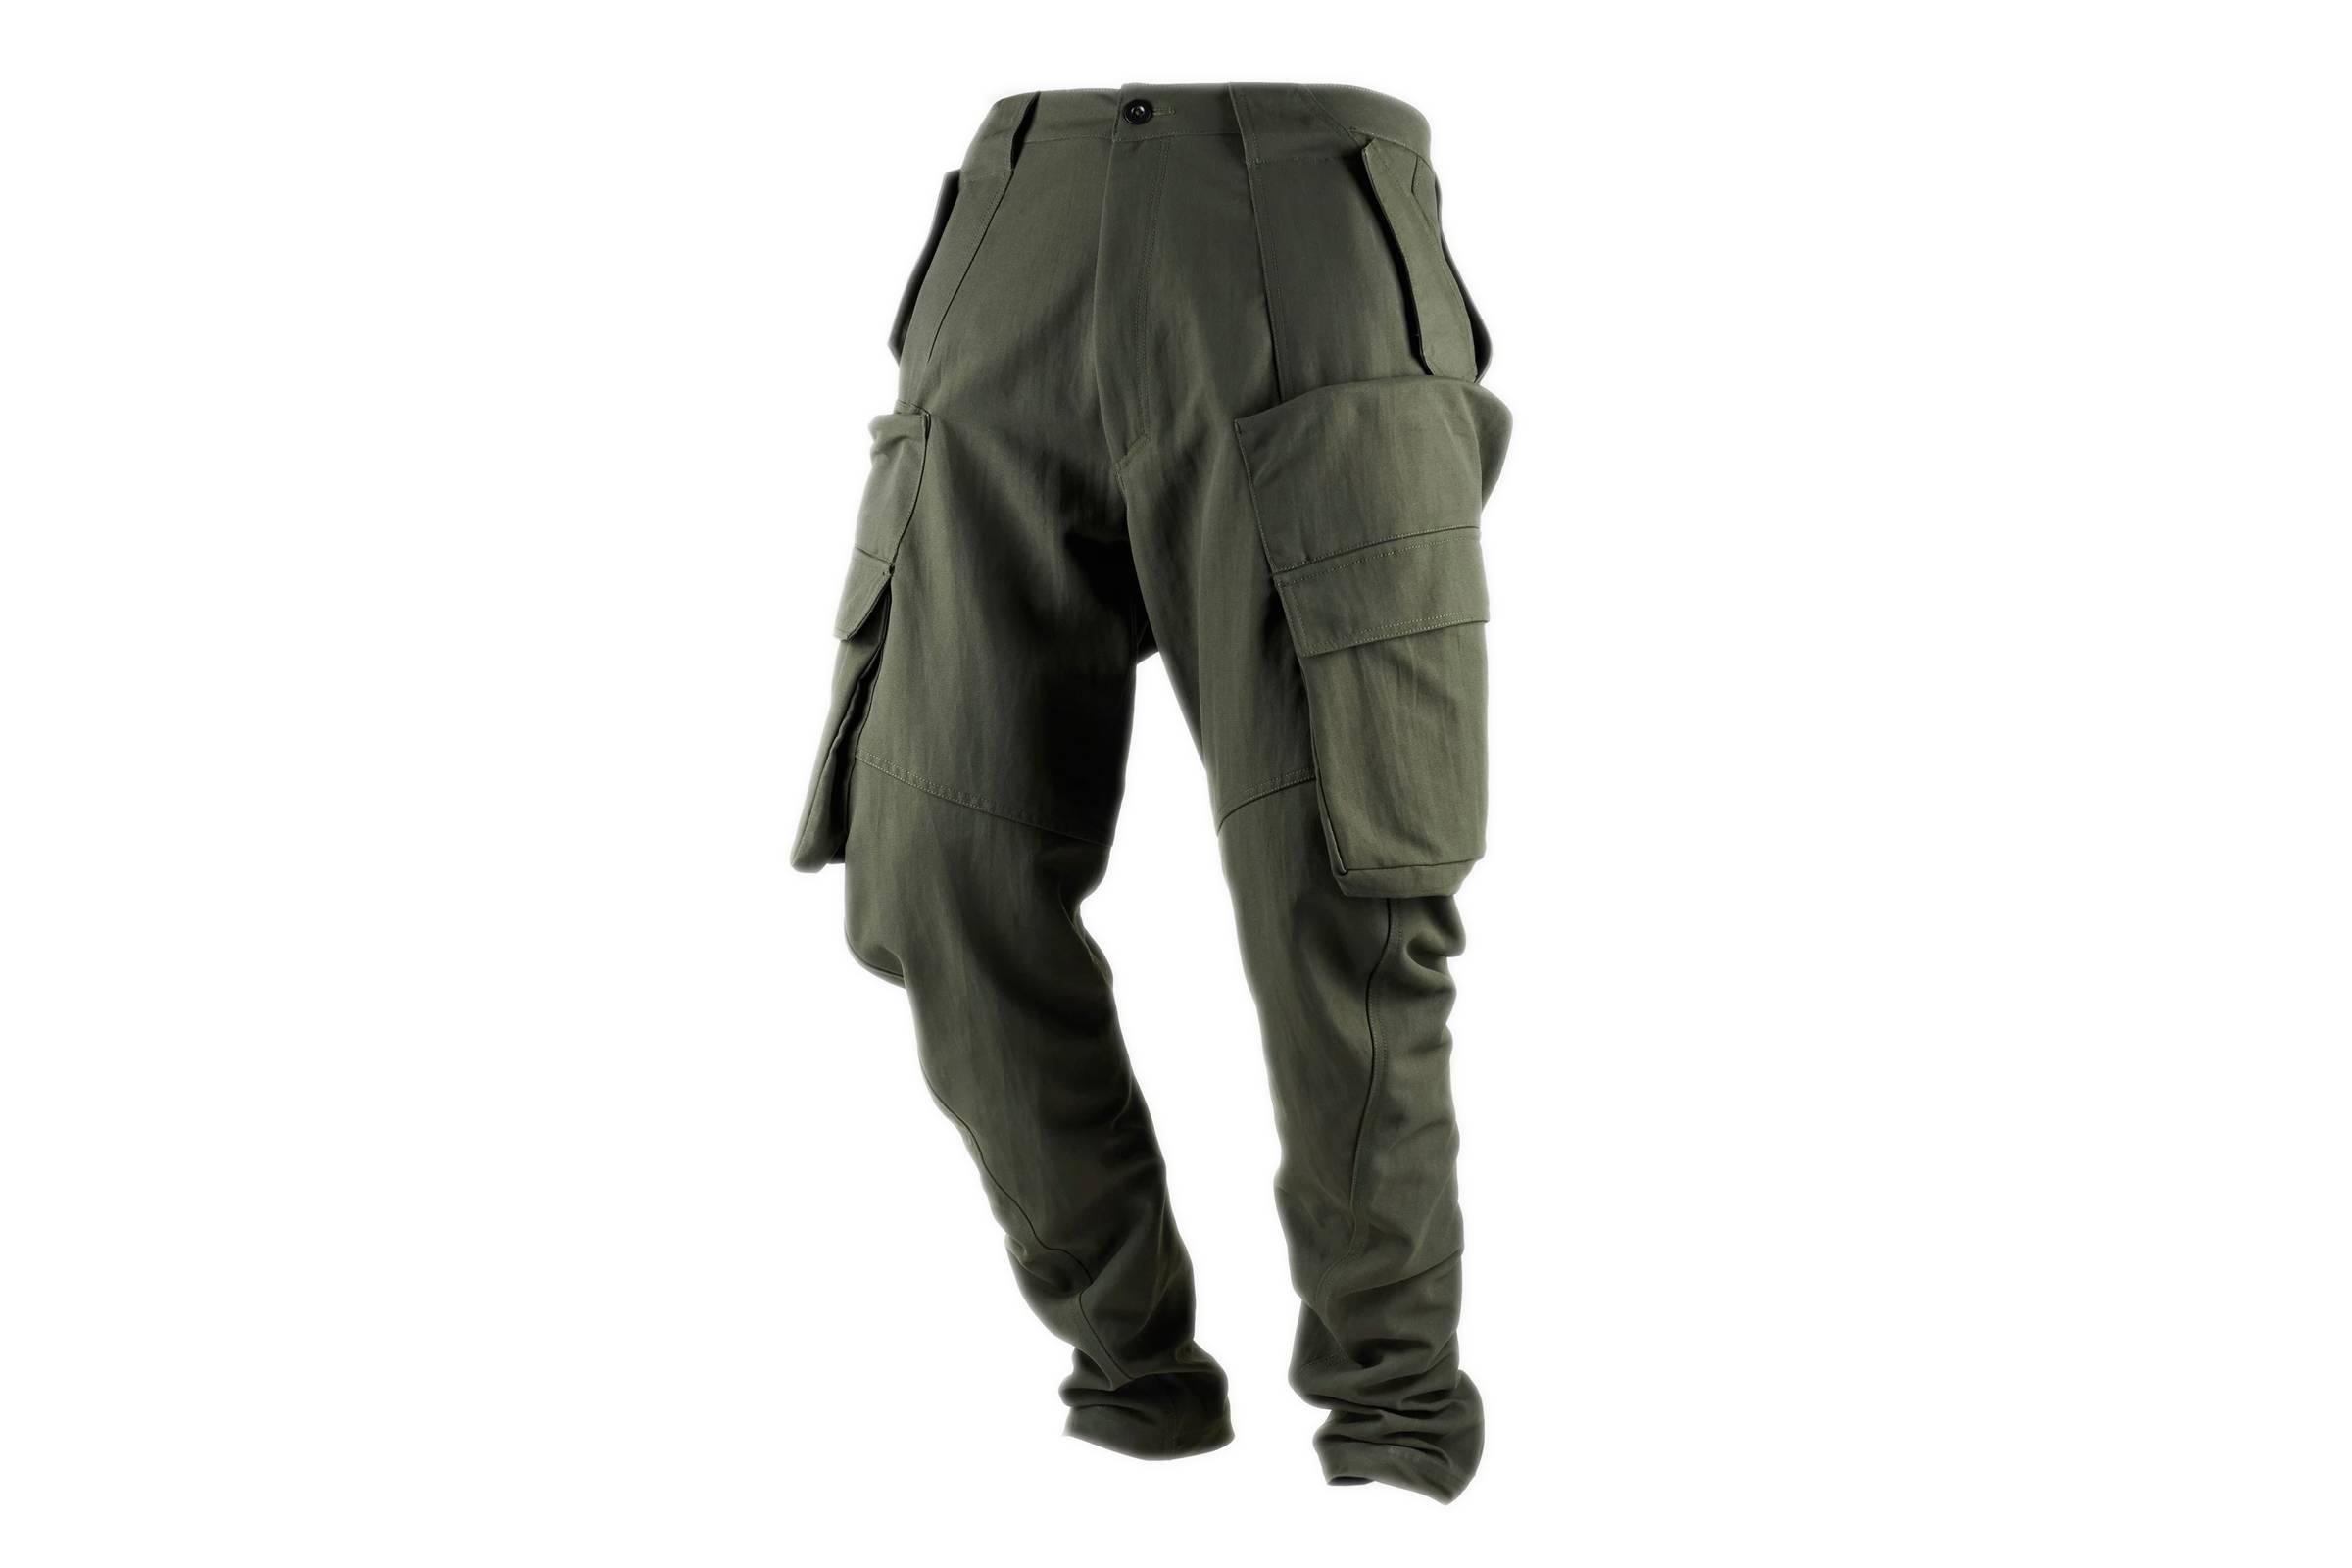 Guerilla Group PL02 Cargo Pant